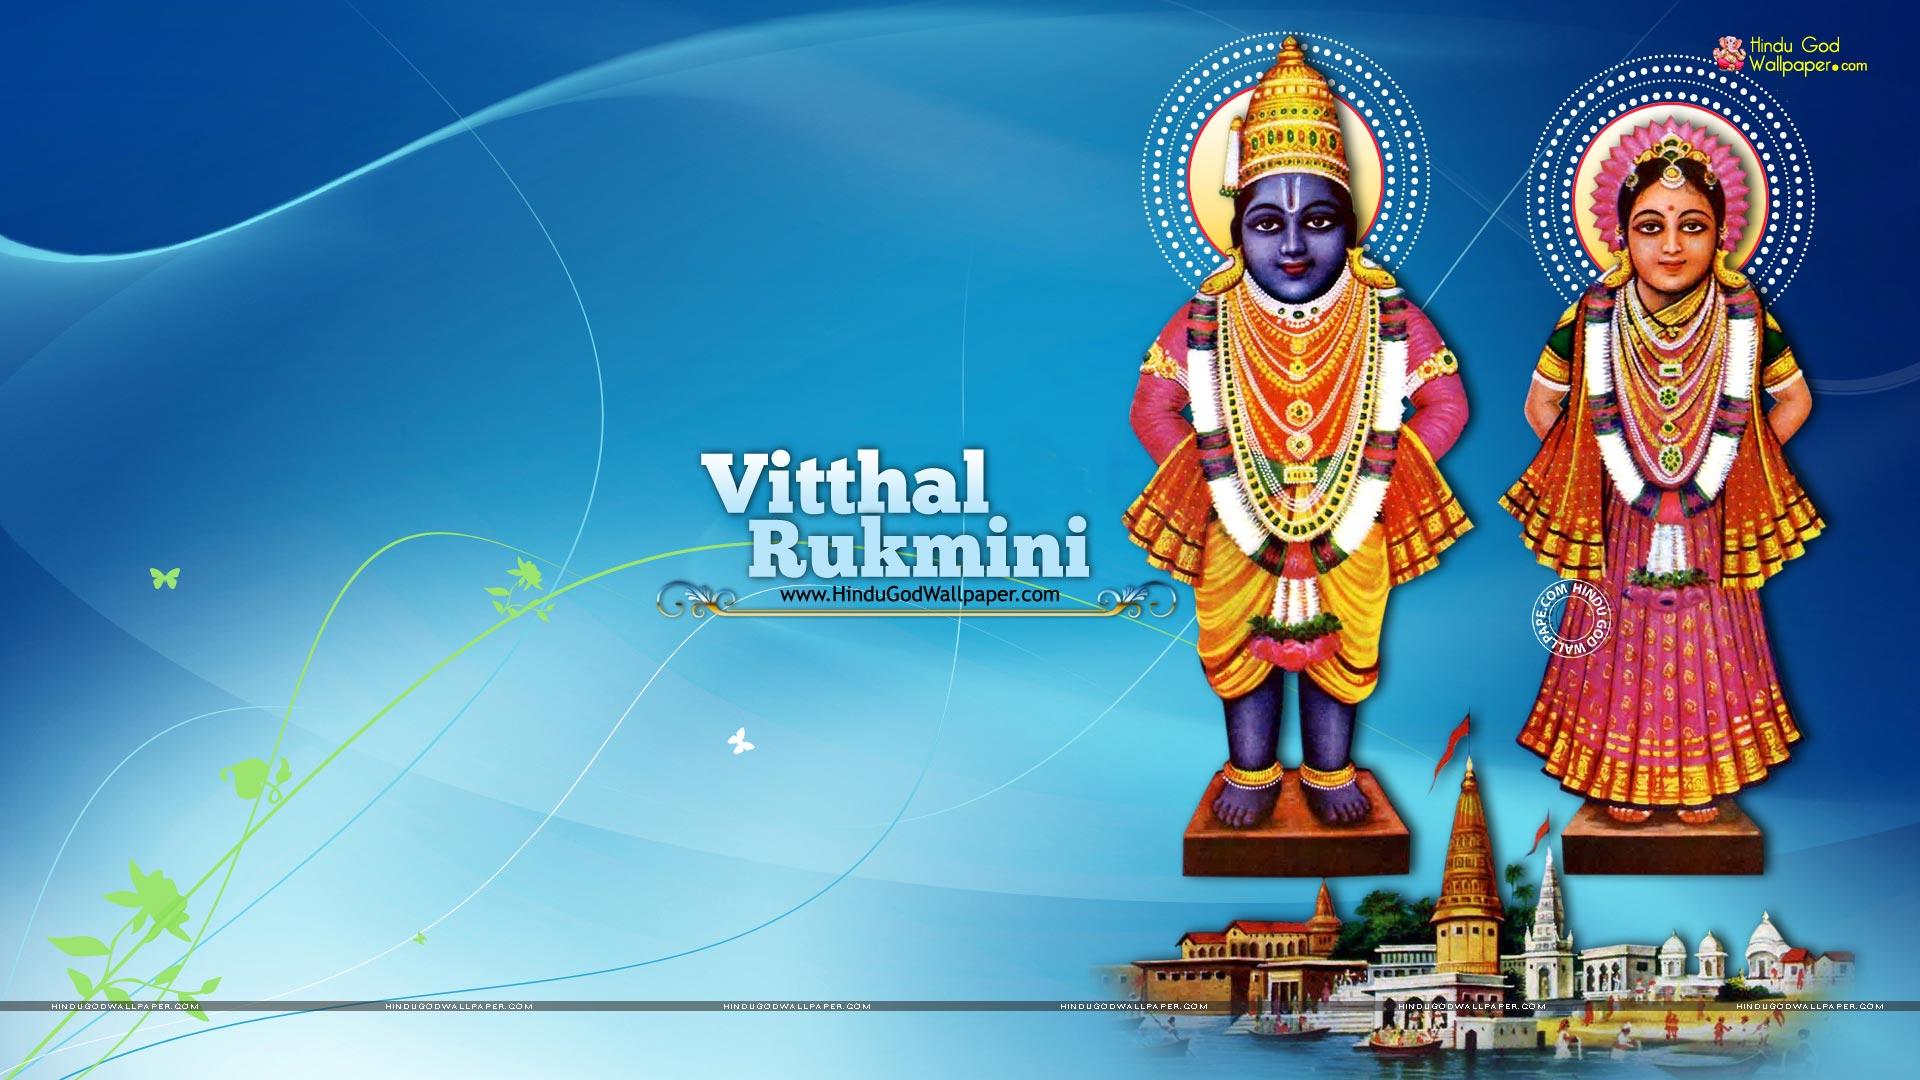 Vitthal Rukmini Hd Wallpaper Images Full Size Download